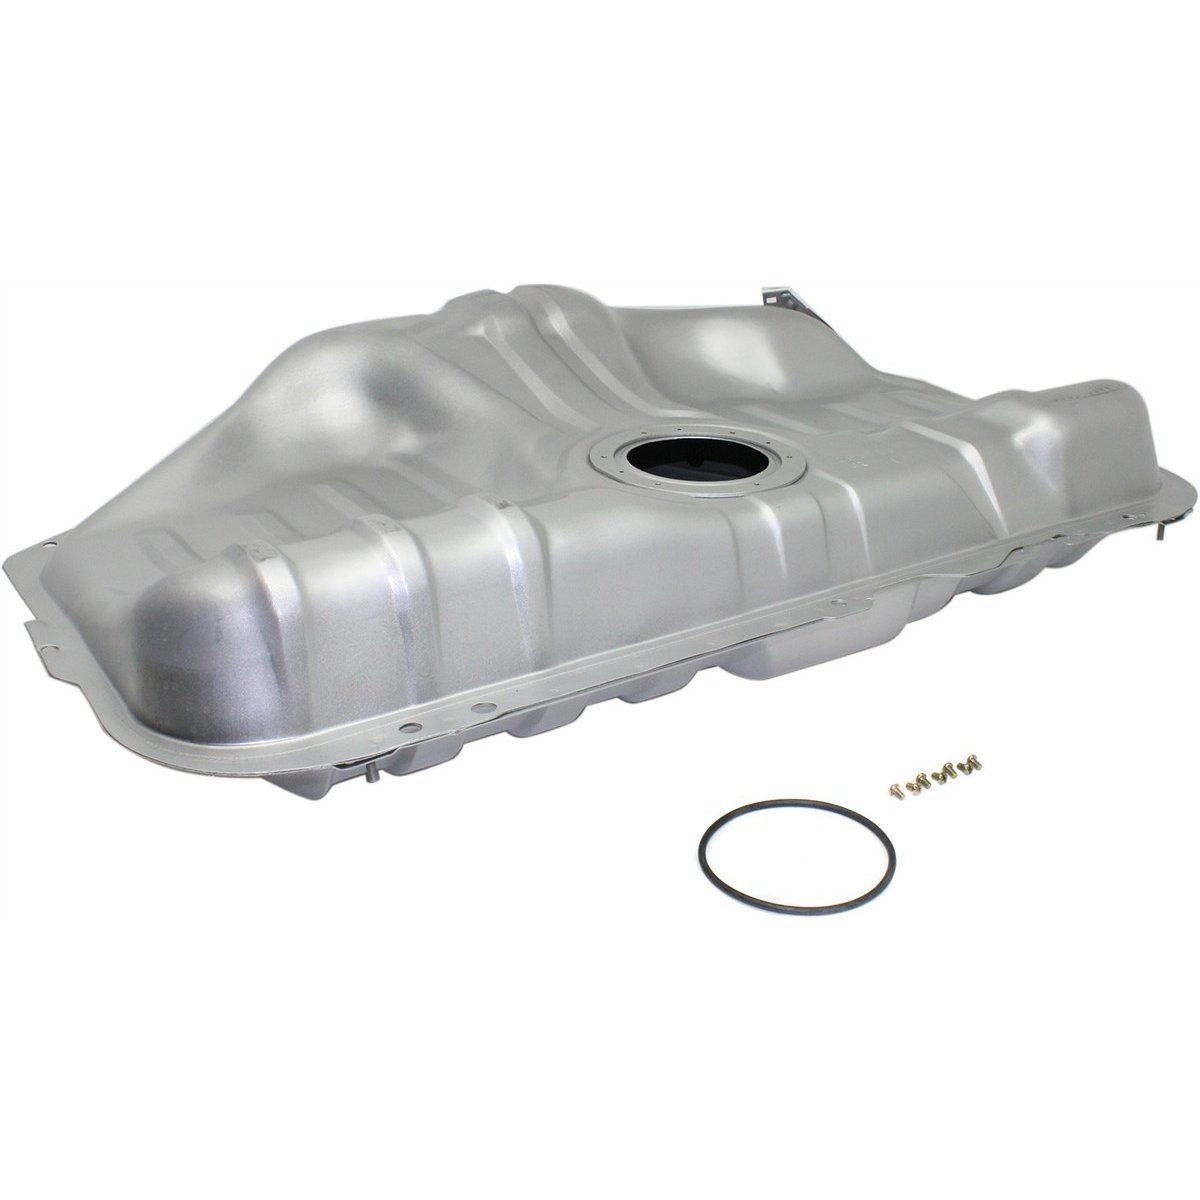 Black 2pc Cold Air Intake Kit /& Filter For 1988-1995 Toyota Pickup 3.0L V6